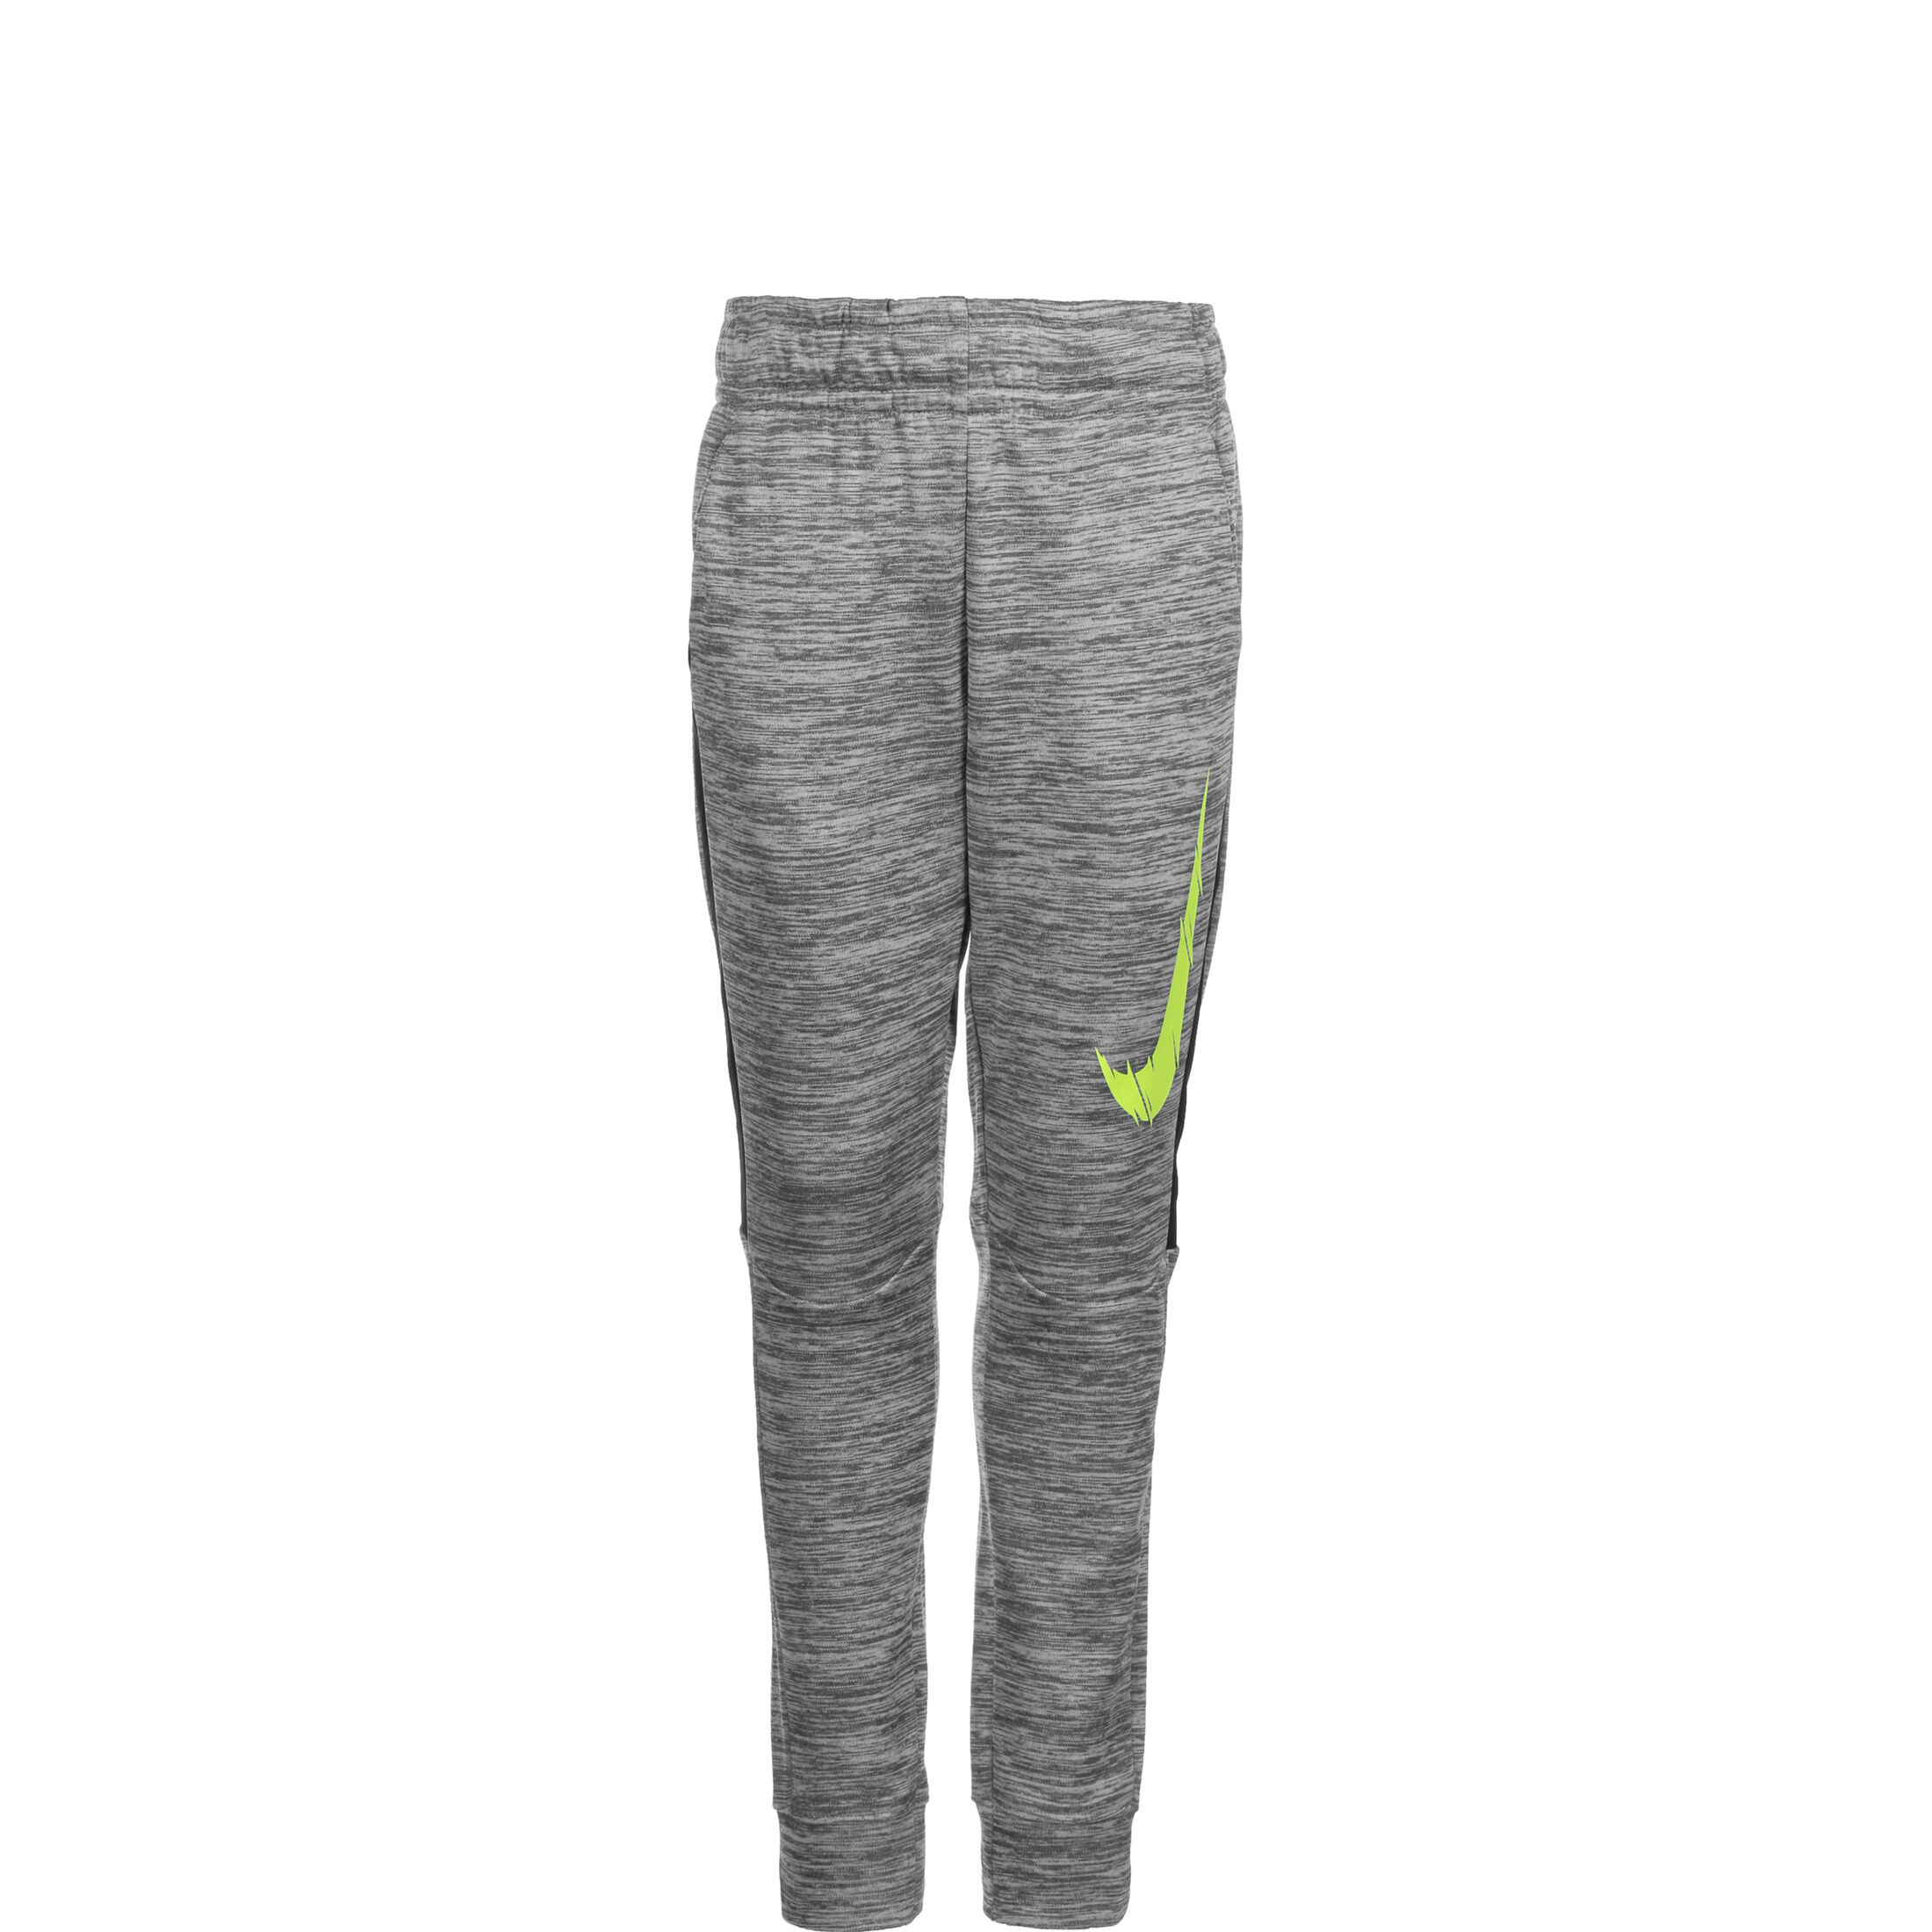 Trainingsbekleidung Nike Sportswear | bei OUTFITTER